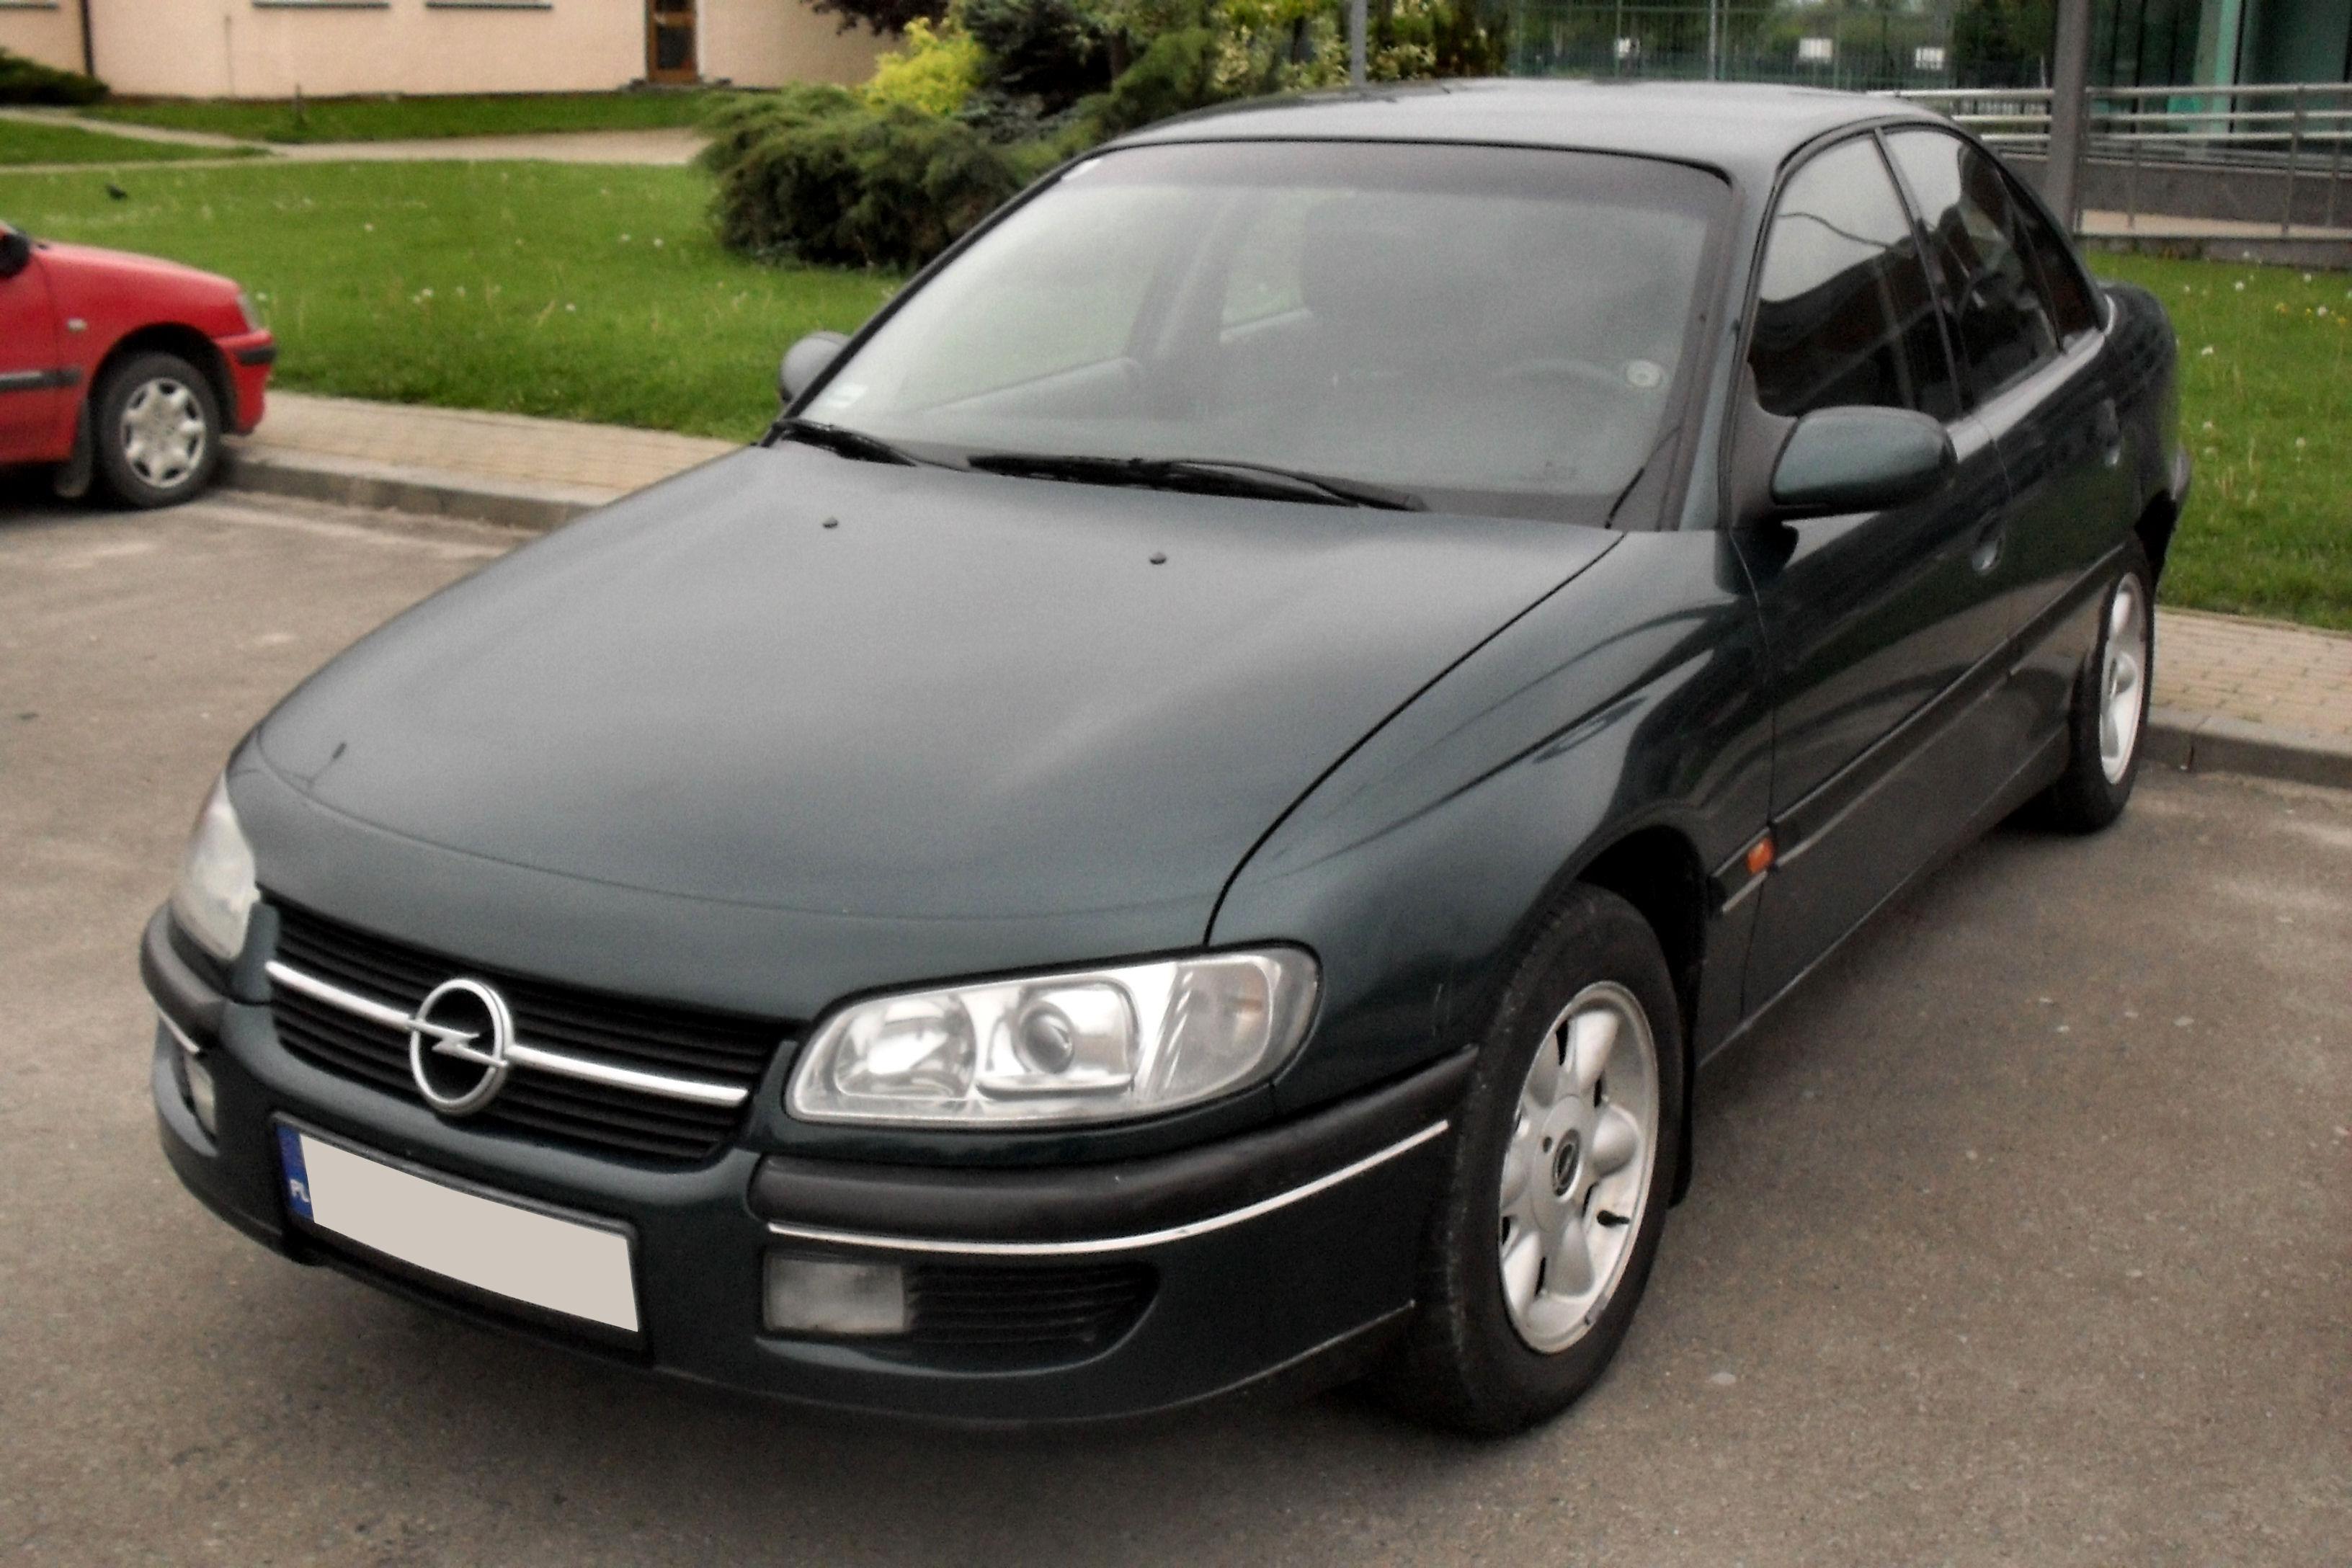 Modish Opel Omega B - Wikipedia, den frie encyklopædi LT-41